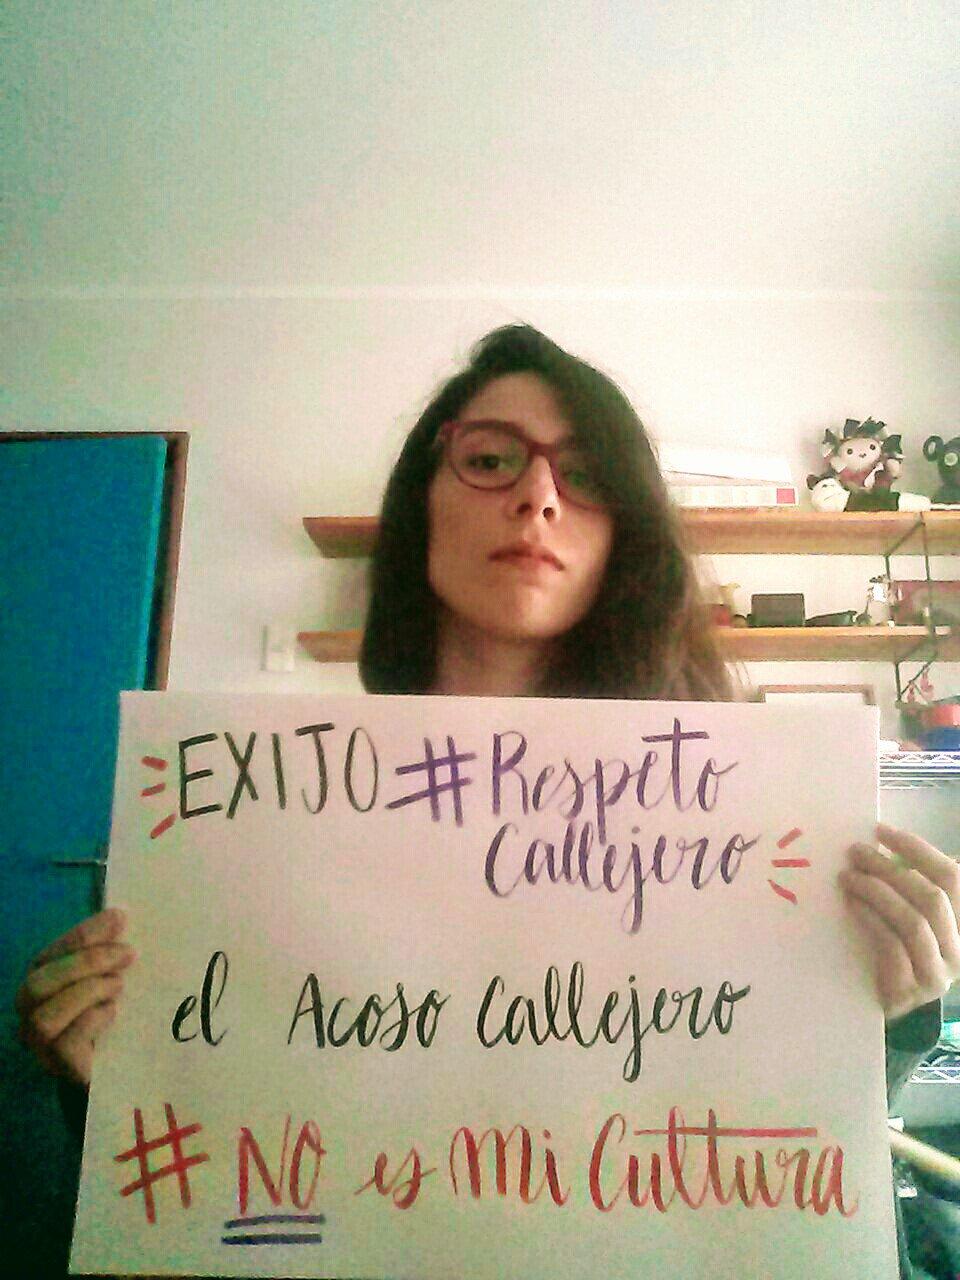 El ASC nada tiene que ver con galantería o folclor. Tampoco con libertad de expresión. ASC es VIOLENCIA, #NoEsMiCultura  #ENDSH @ocacchile https://t.co/Xd8wTaHOmC